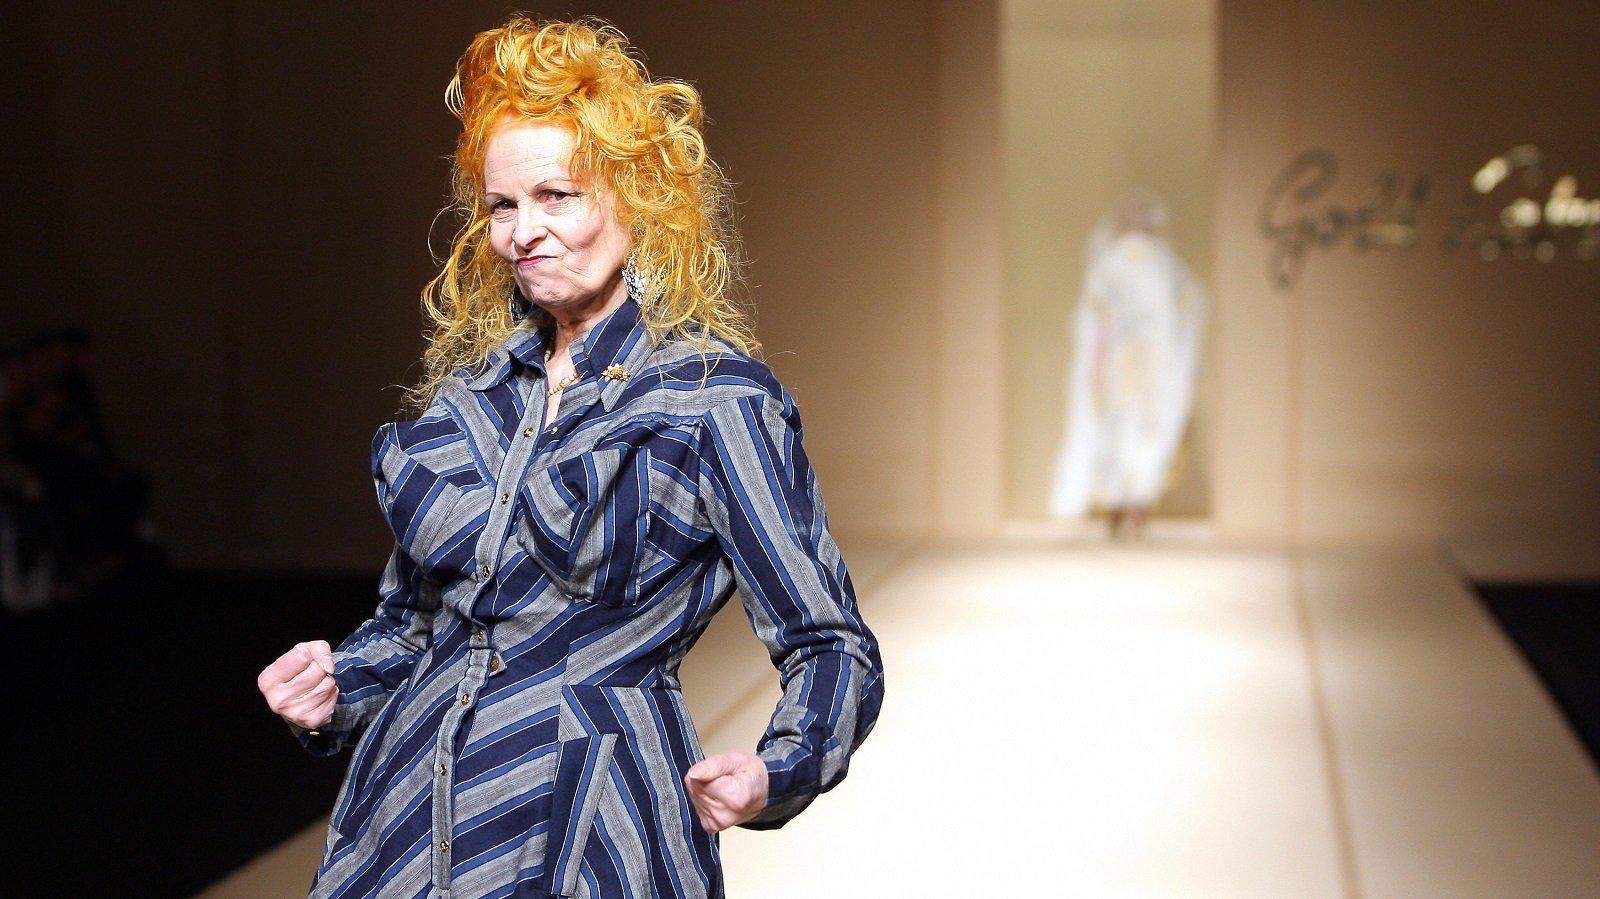 El lujo irreverente de Vivienne Westwood